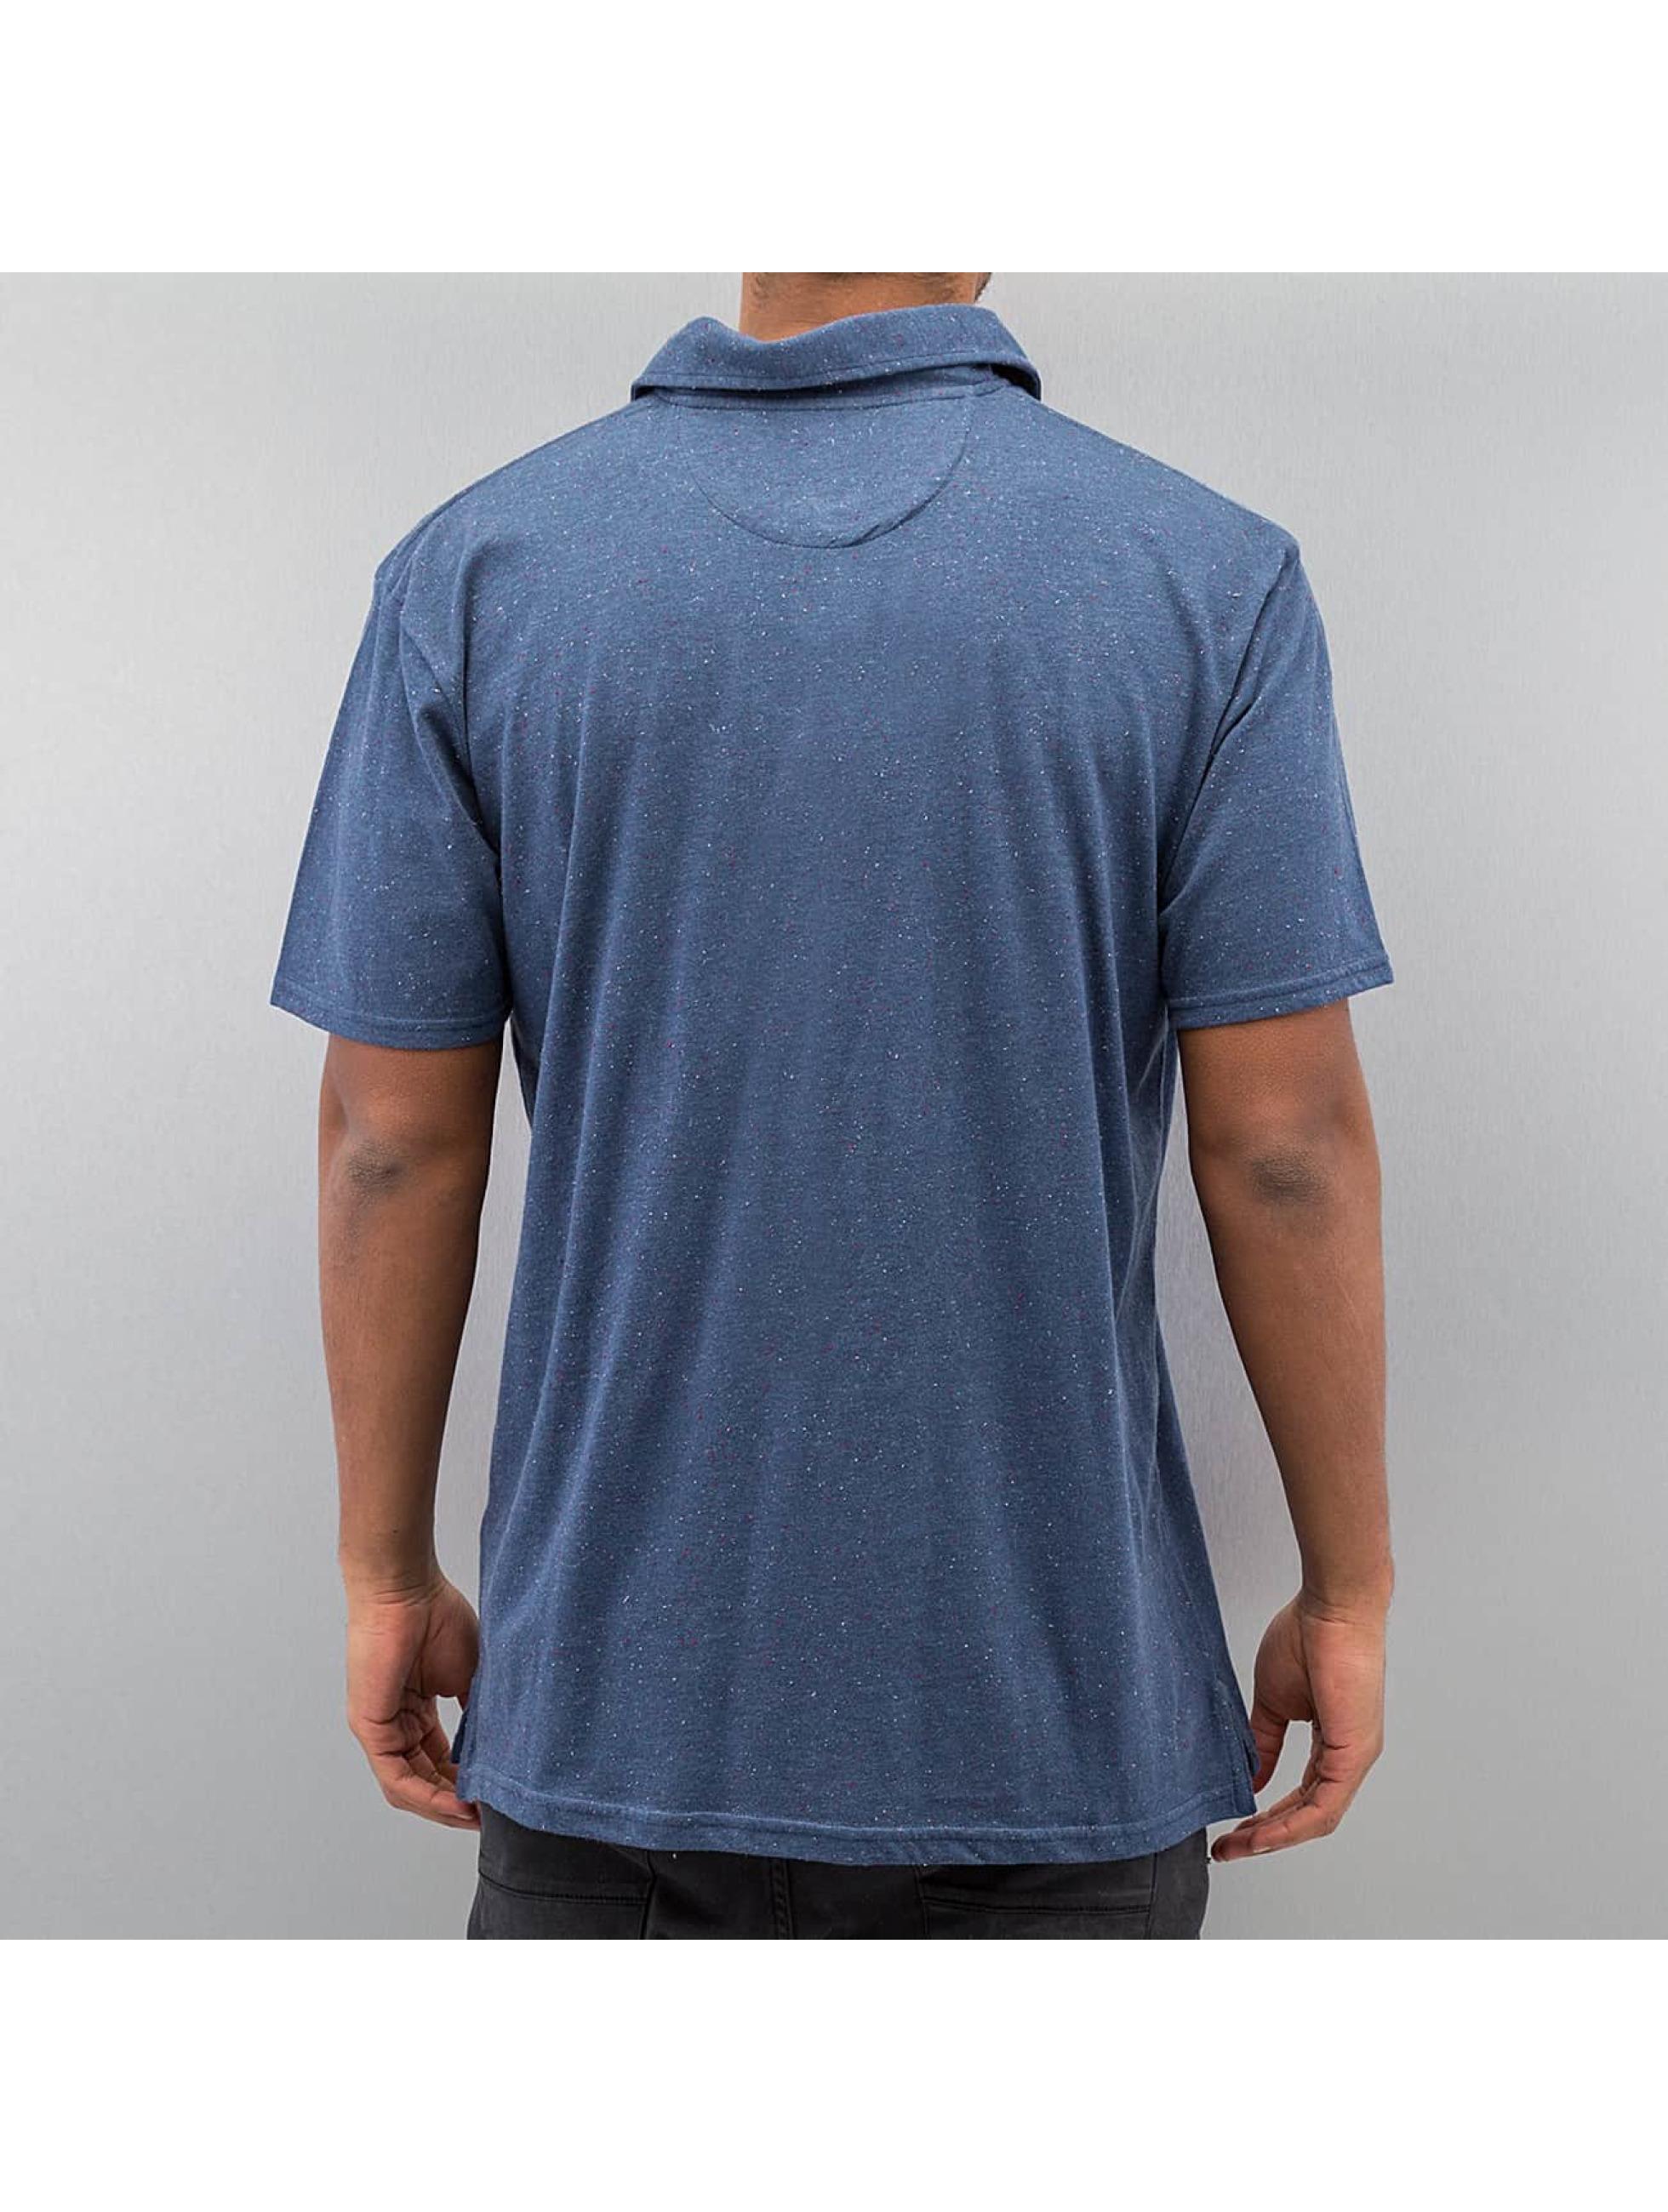 Quiksilver Poloshirt Neat Swivel blau